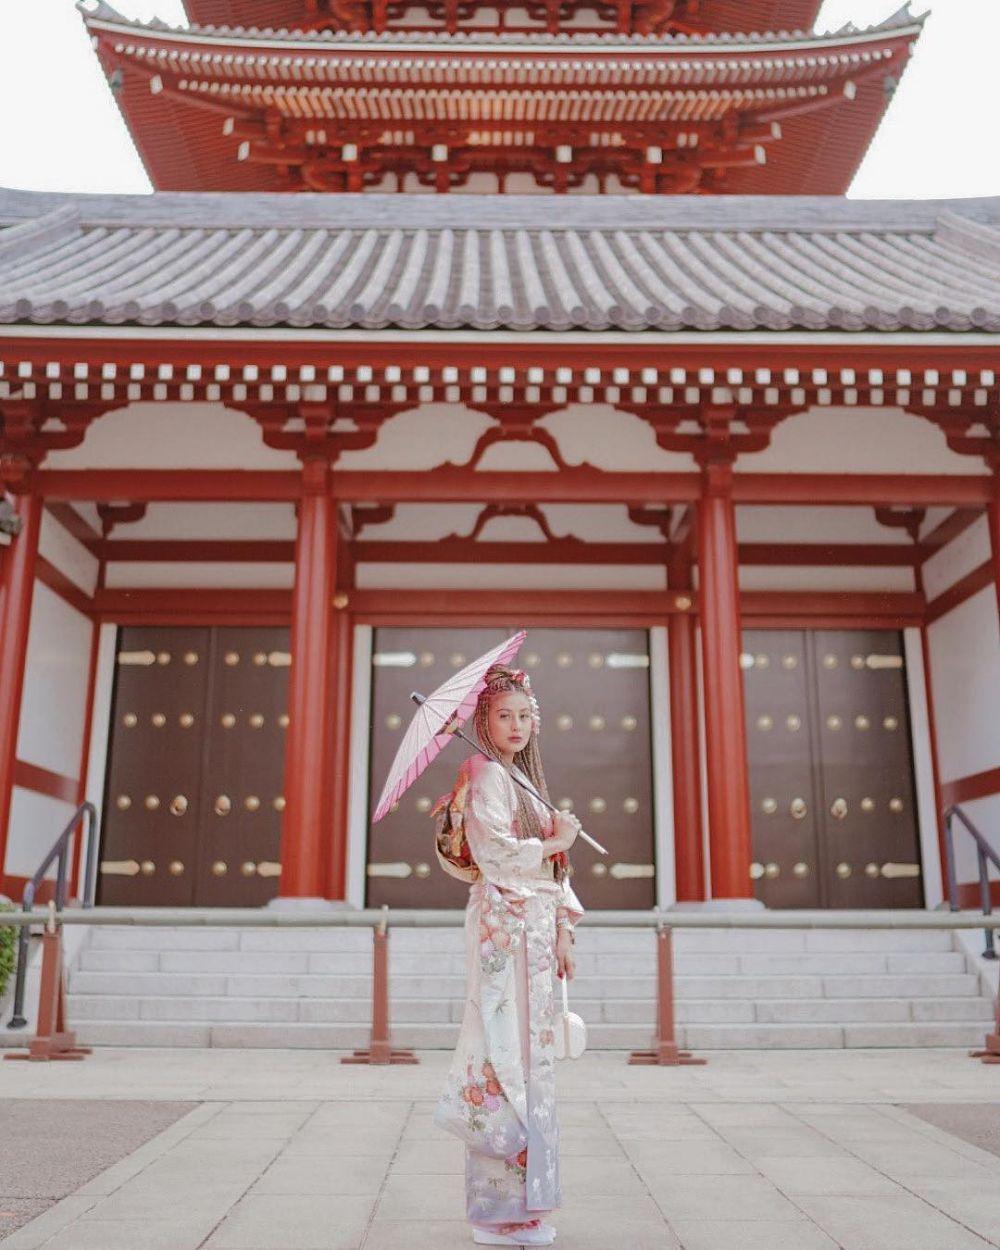 Potret Awkarin pakai kimono di Jepang © 2019 brilio.net